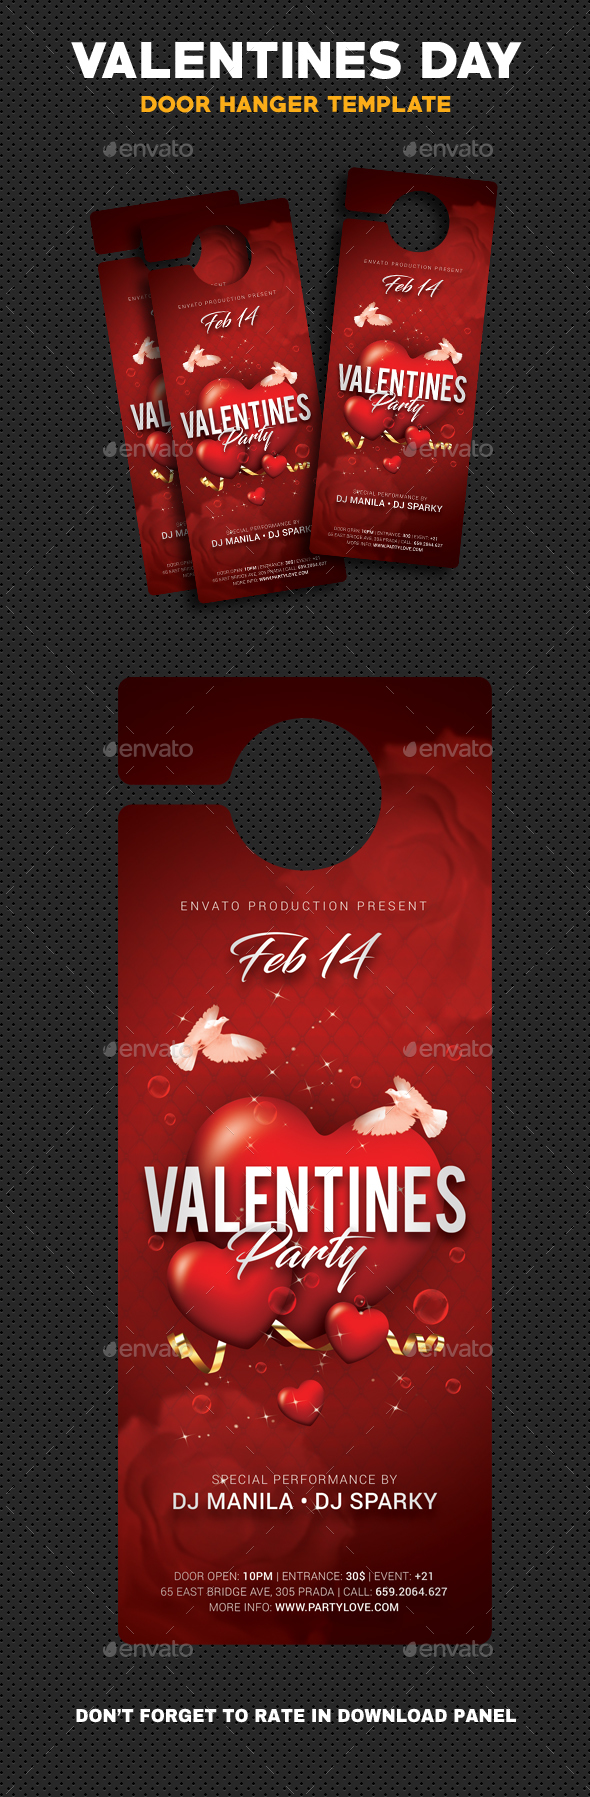 Valentines Day Party Door Hanger - Cards & Invites Print Templates